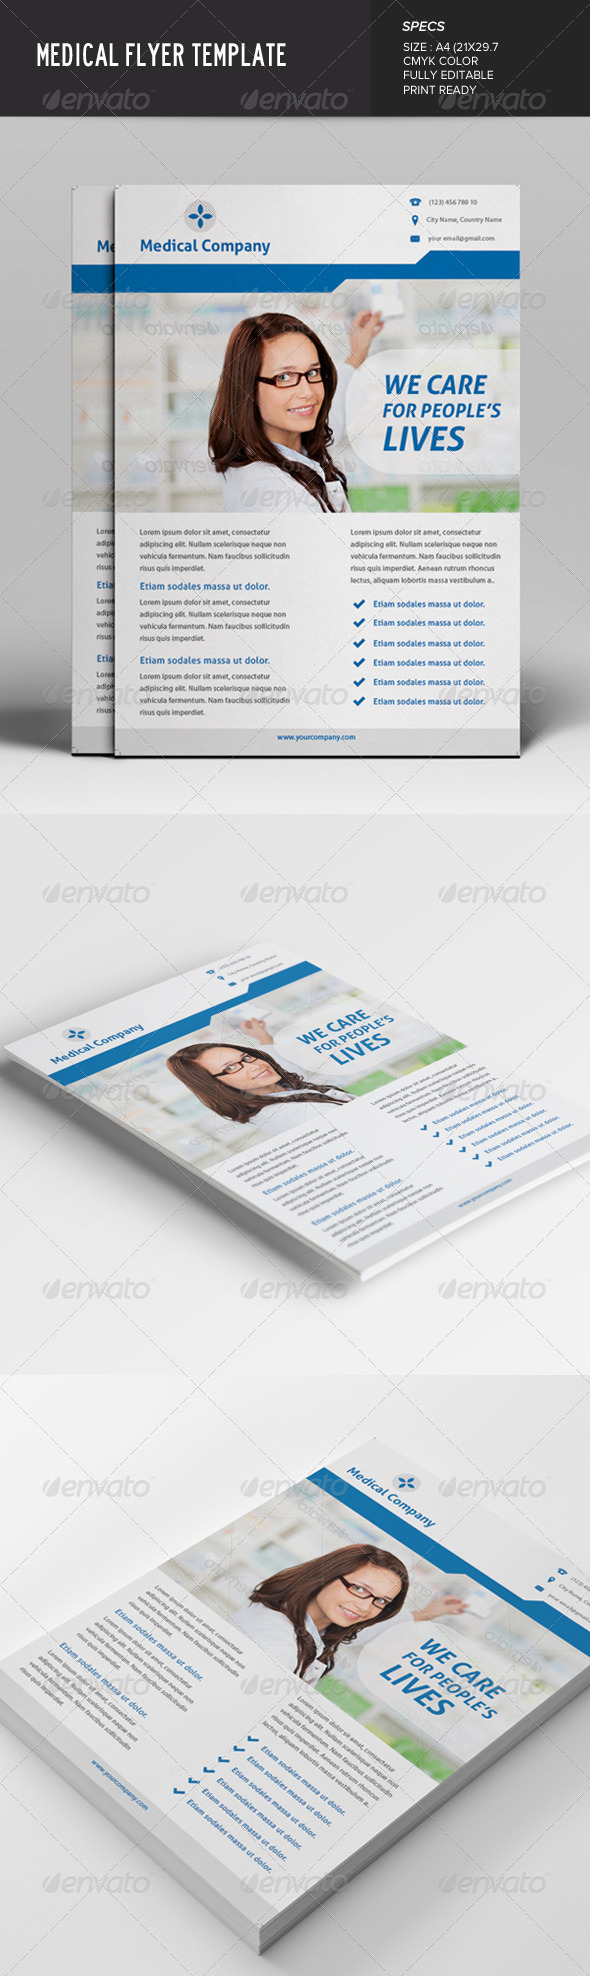 GraphicRiver Medical Flyer 7641778